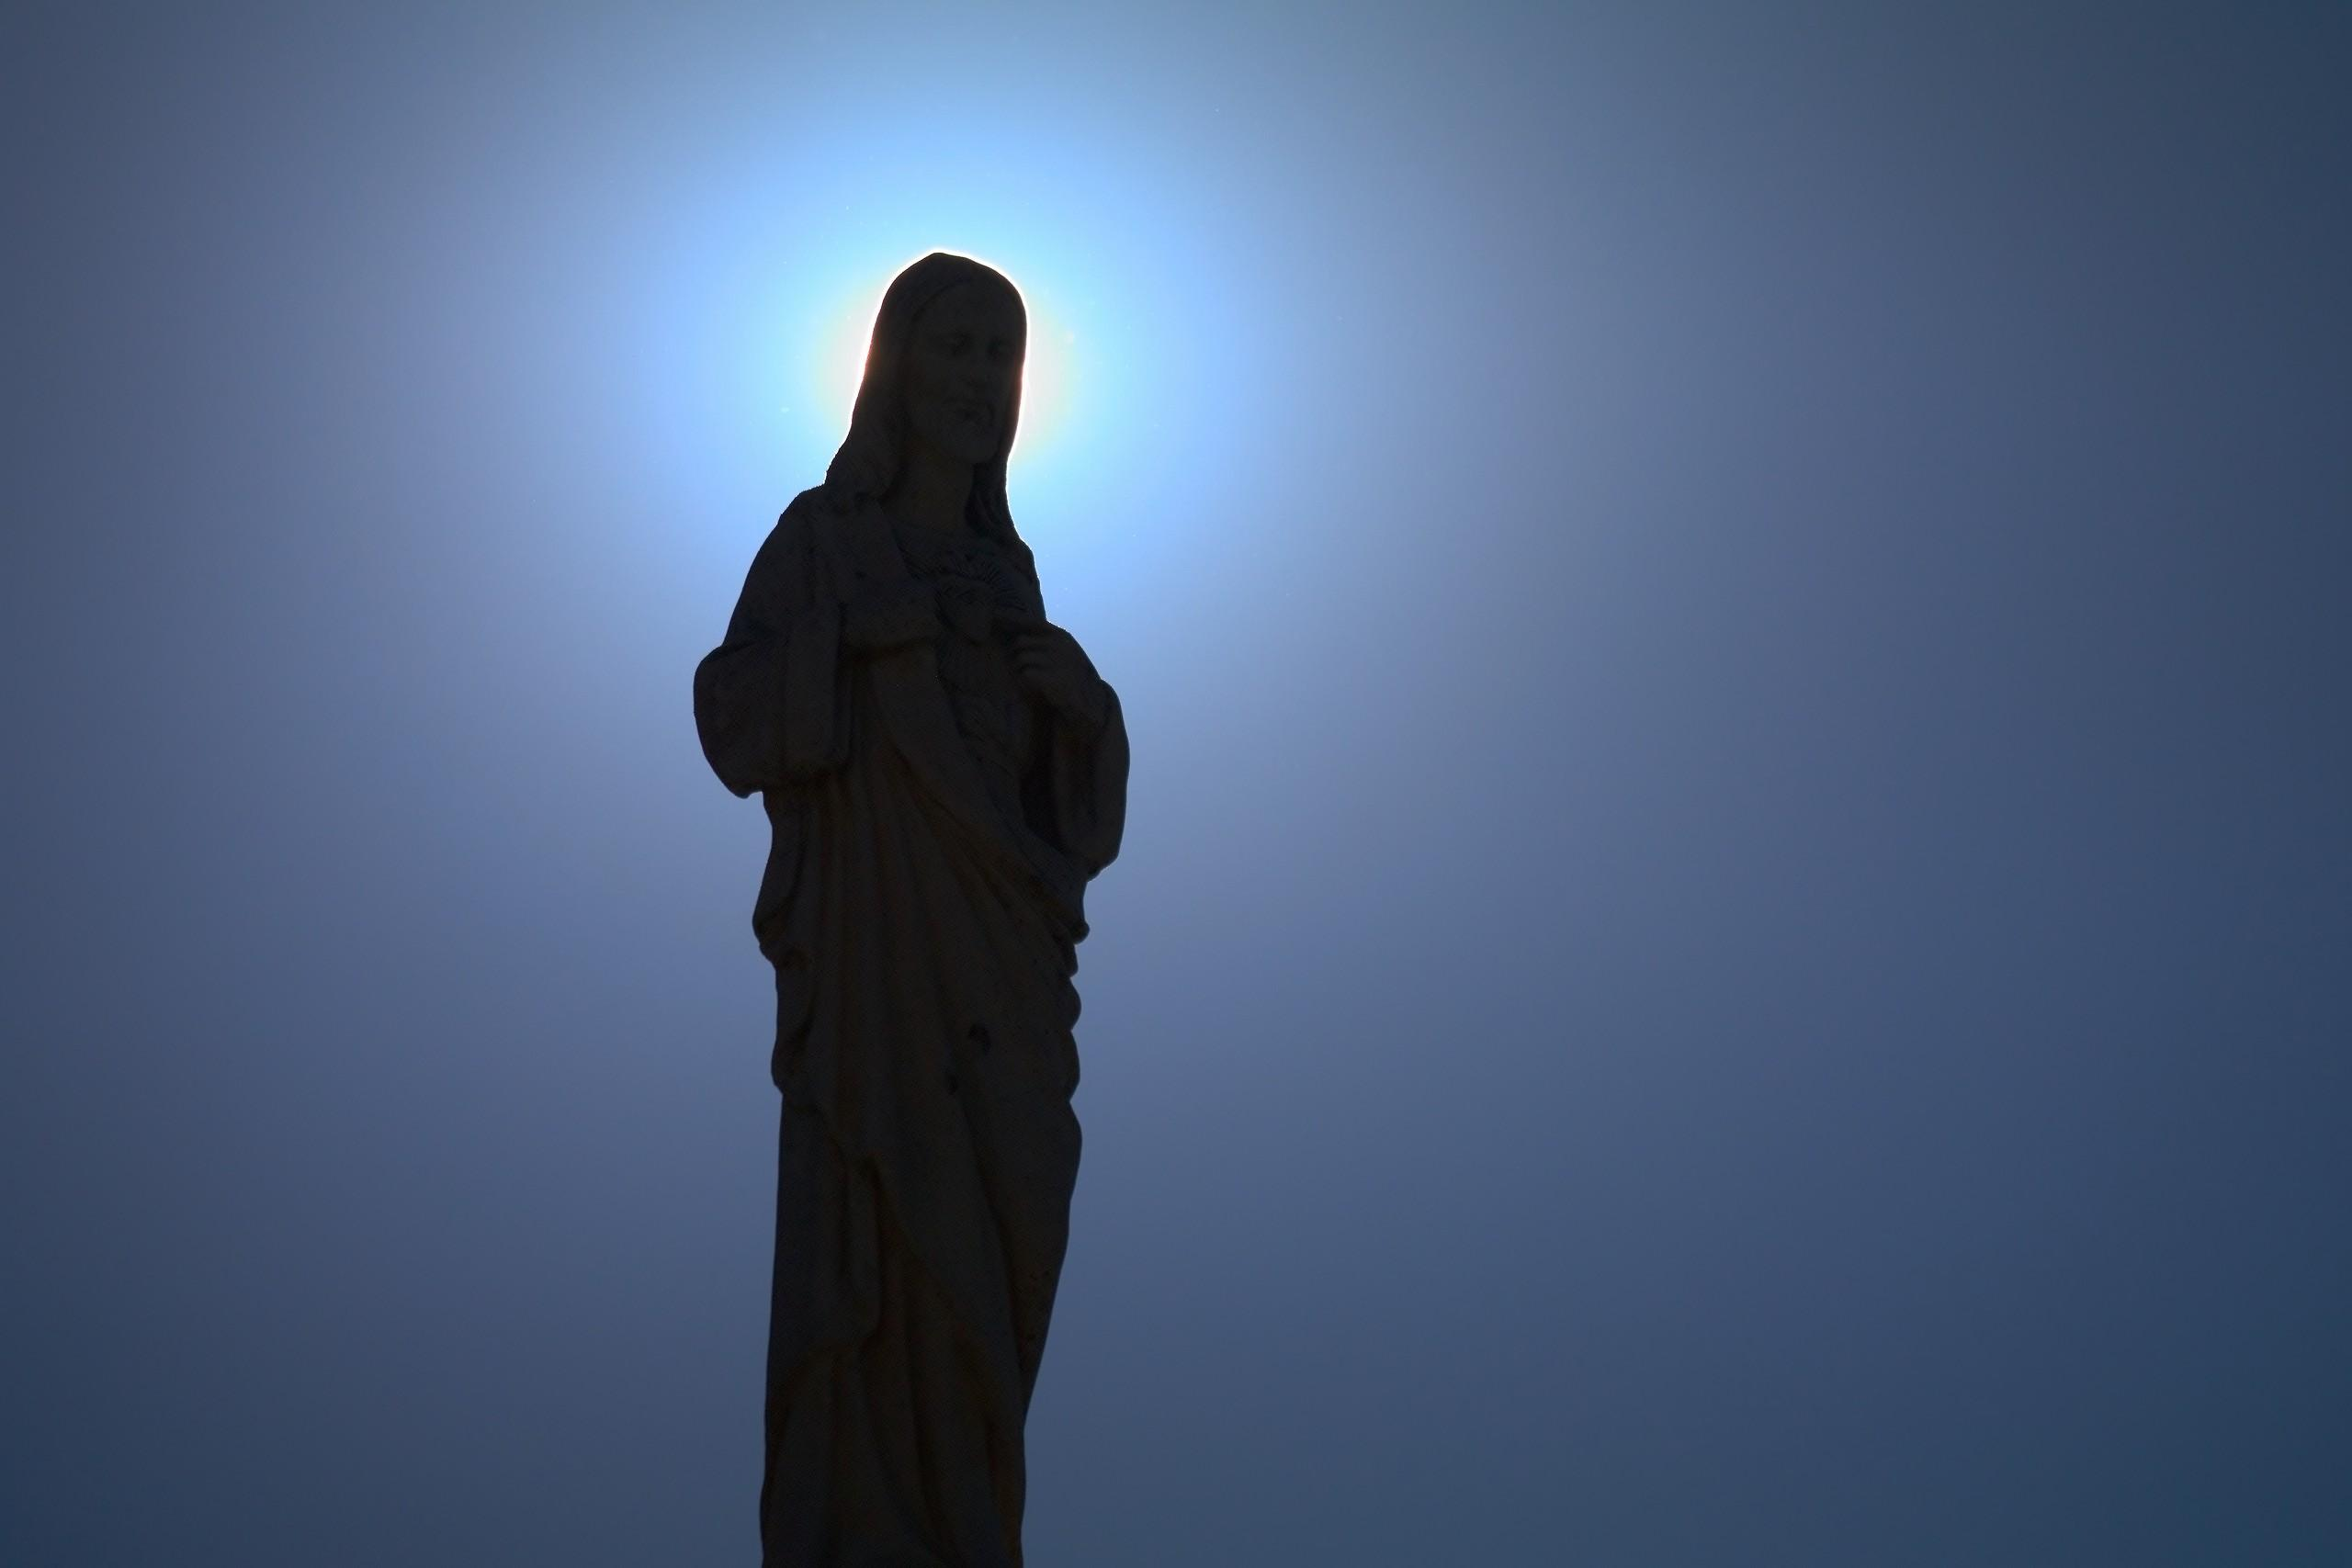 La Virgen de la Peña